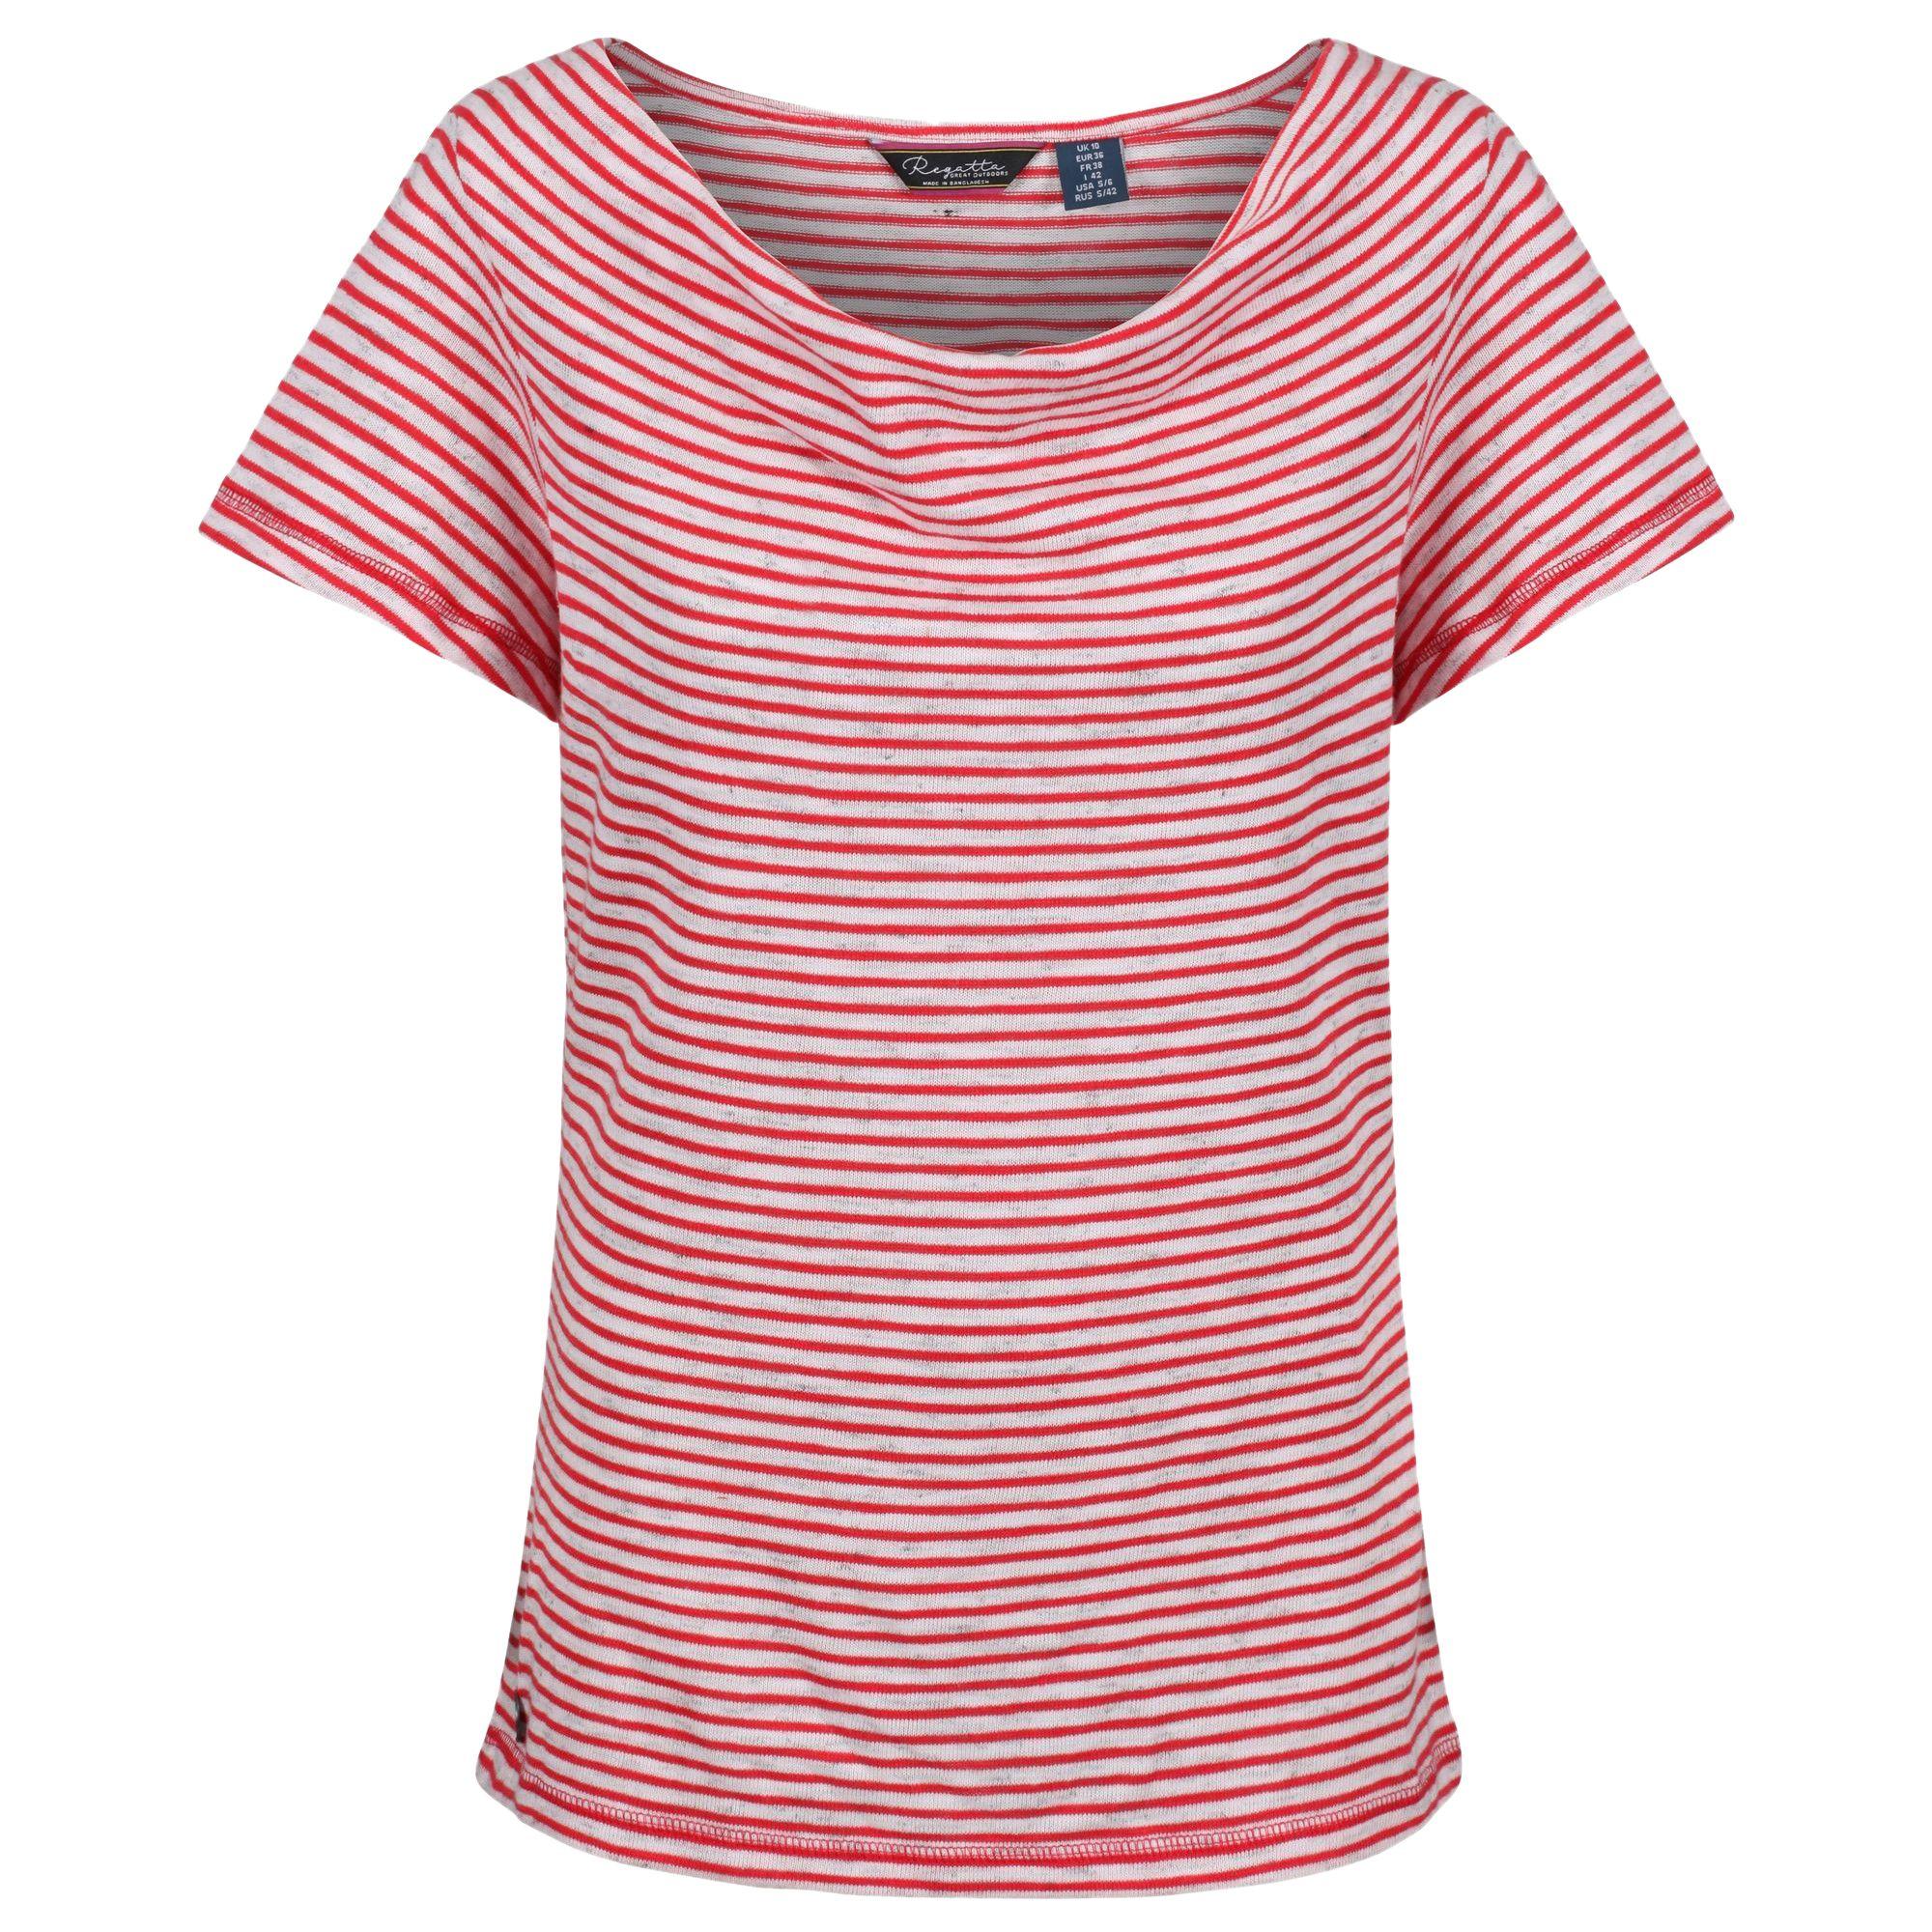 Regatta Womens/Ladies Francheska Short Sleeve T-Shirt